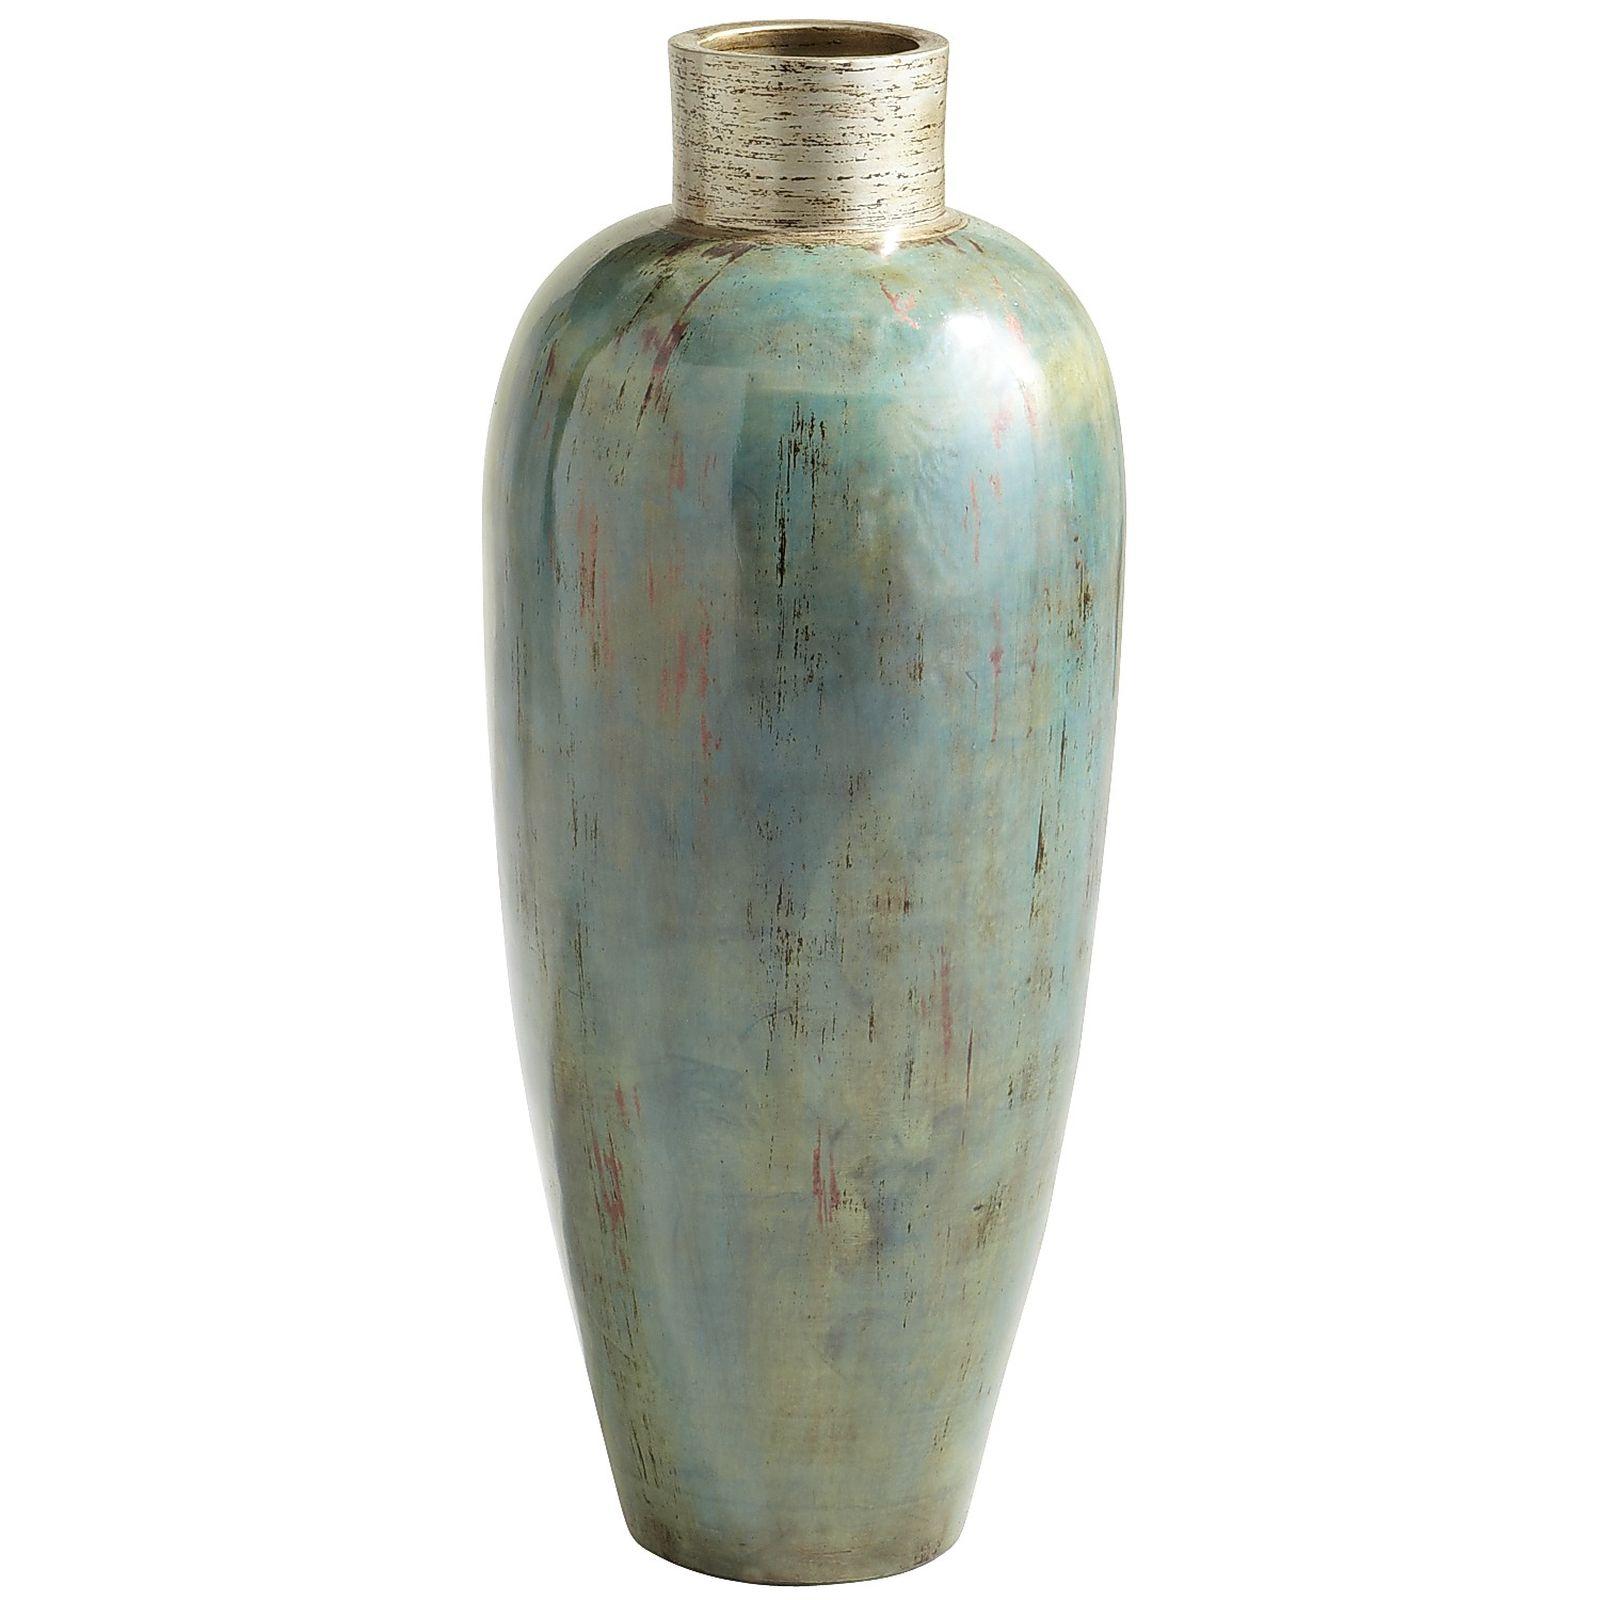 pier-1-imports-floor-vase